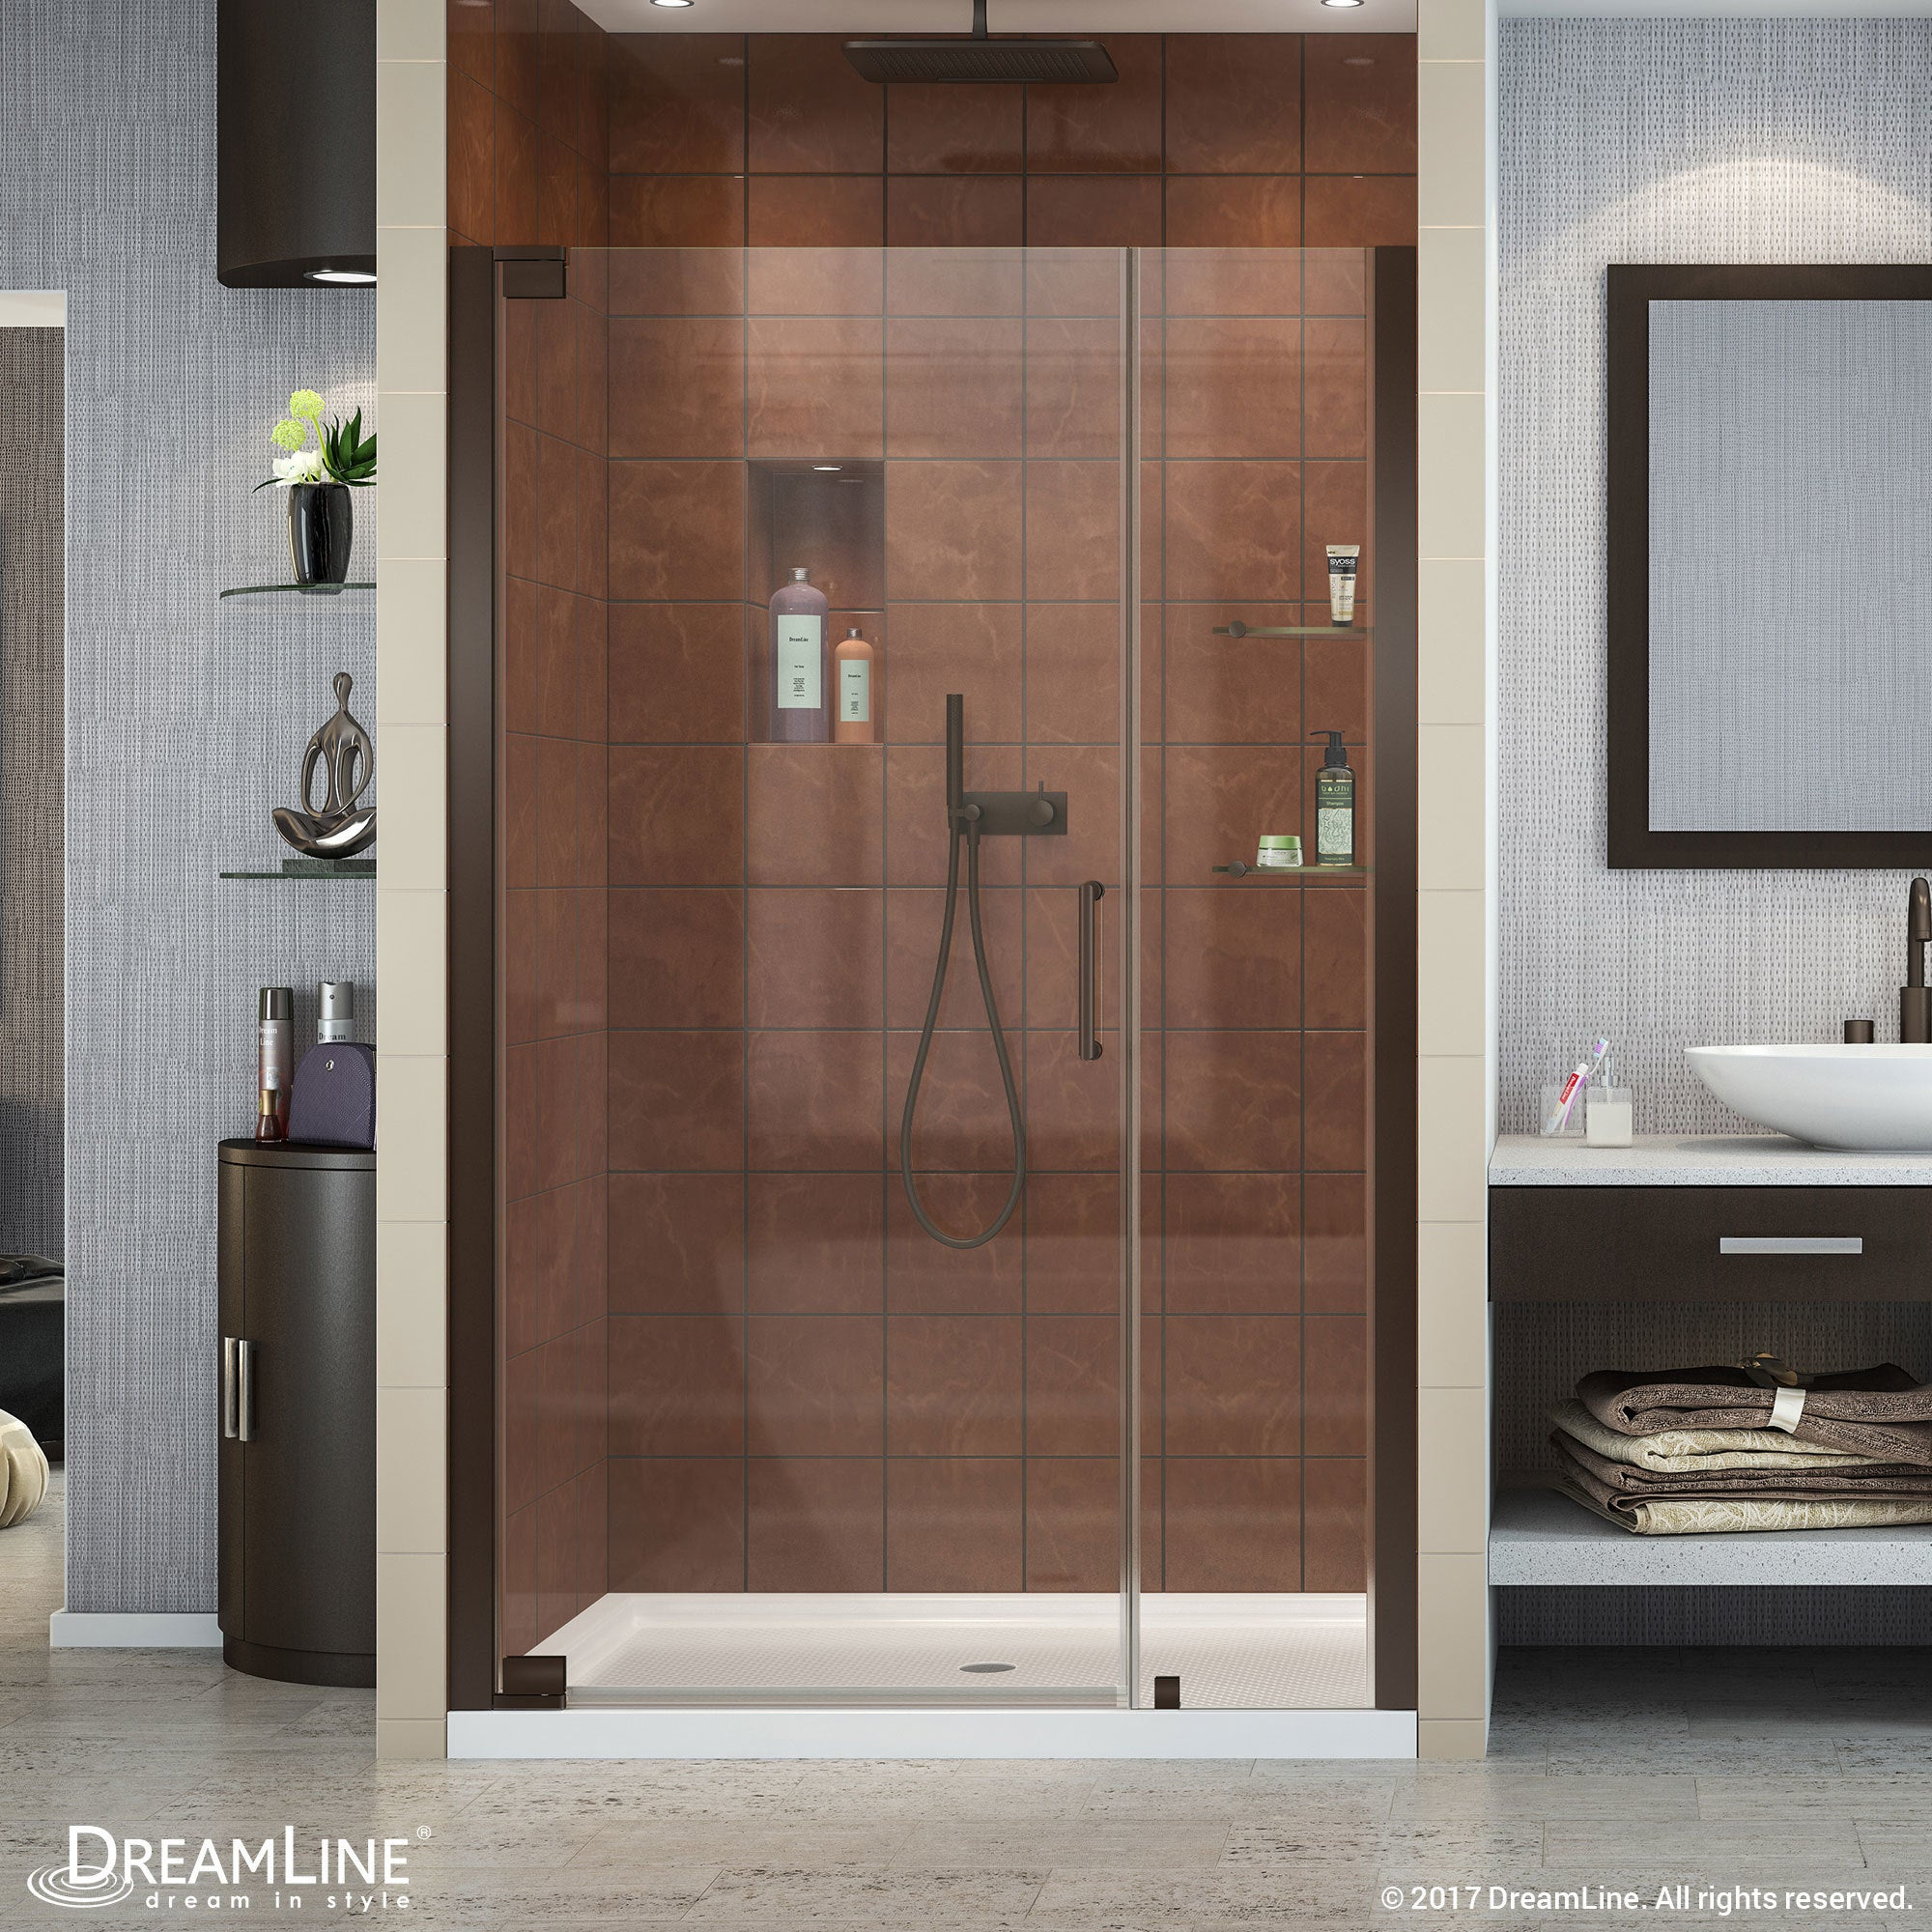 Dreamline Elegance 46 48 In W X 72 In H Frameless Pivot Shower Door 46 48 W